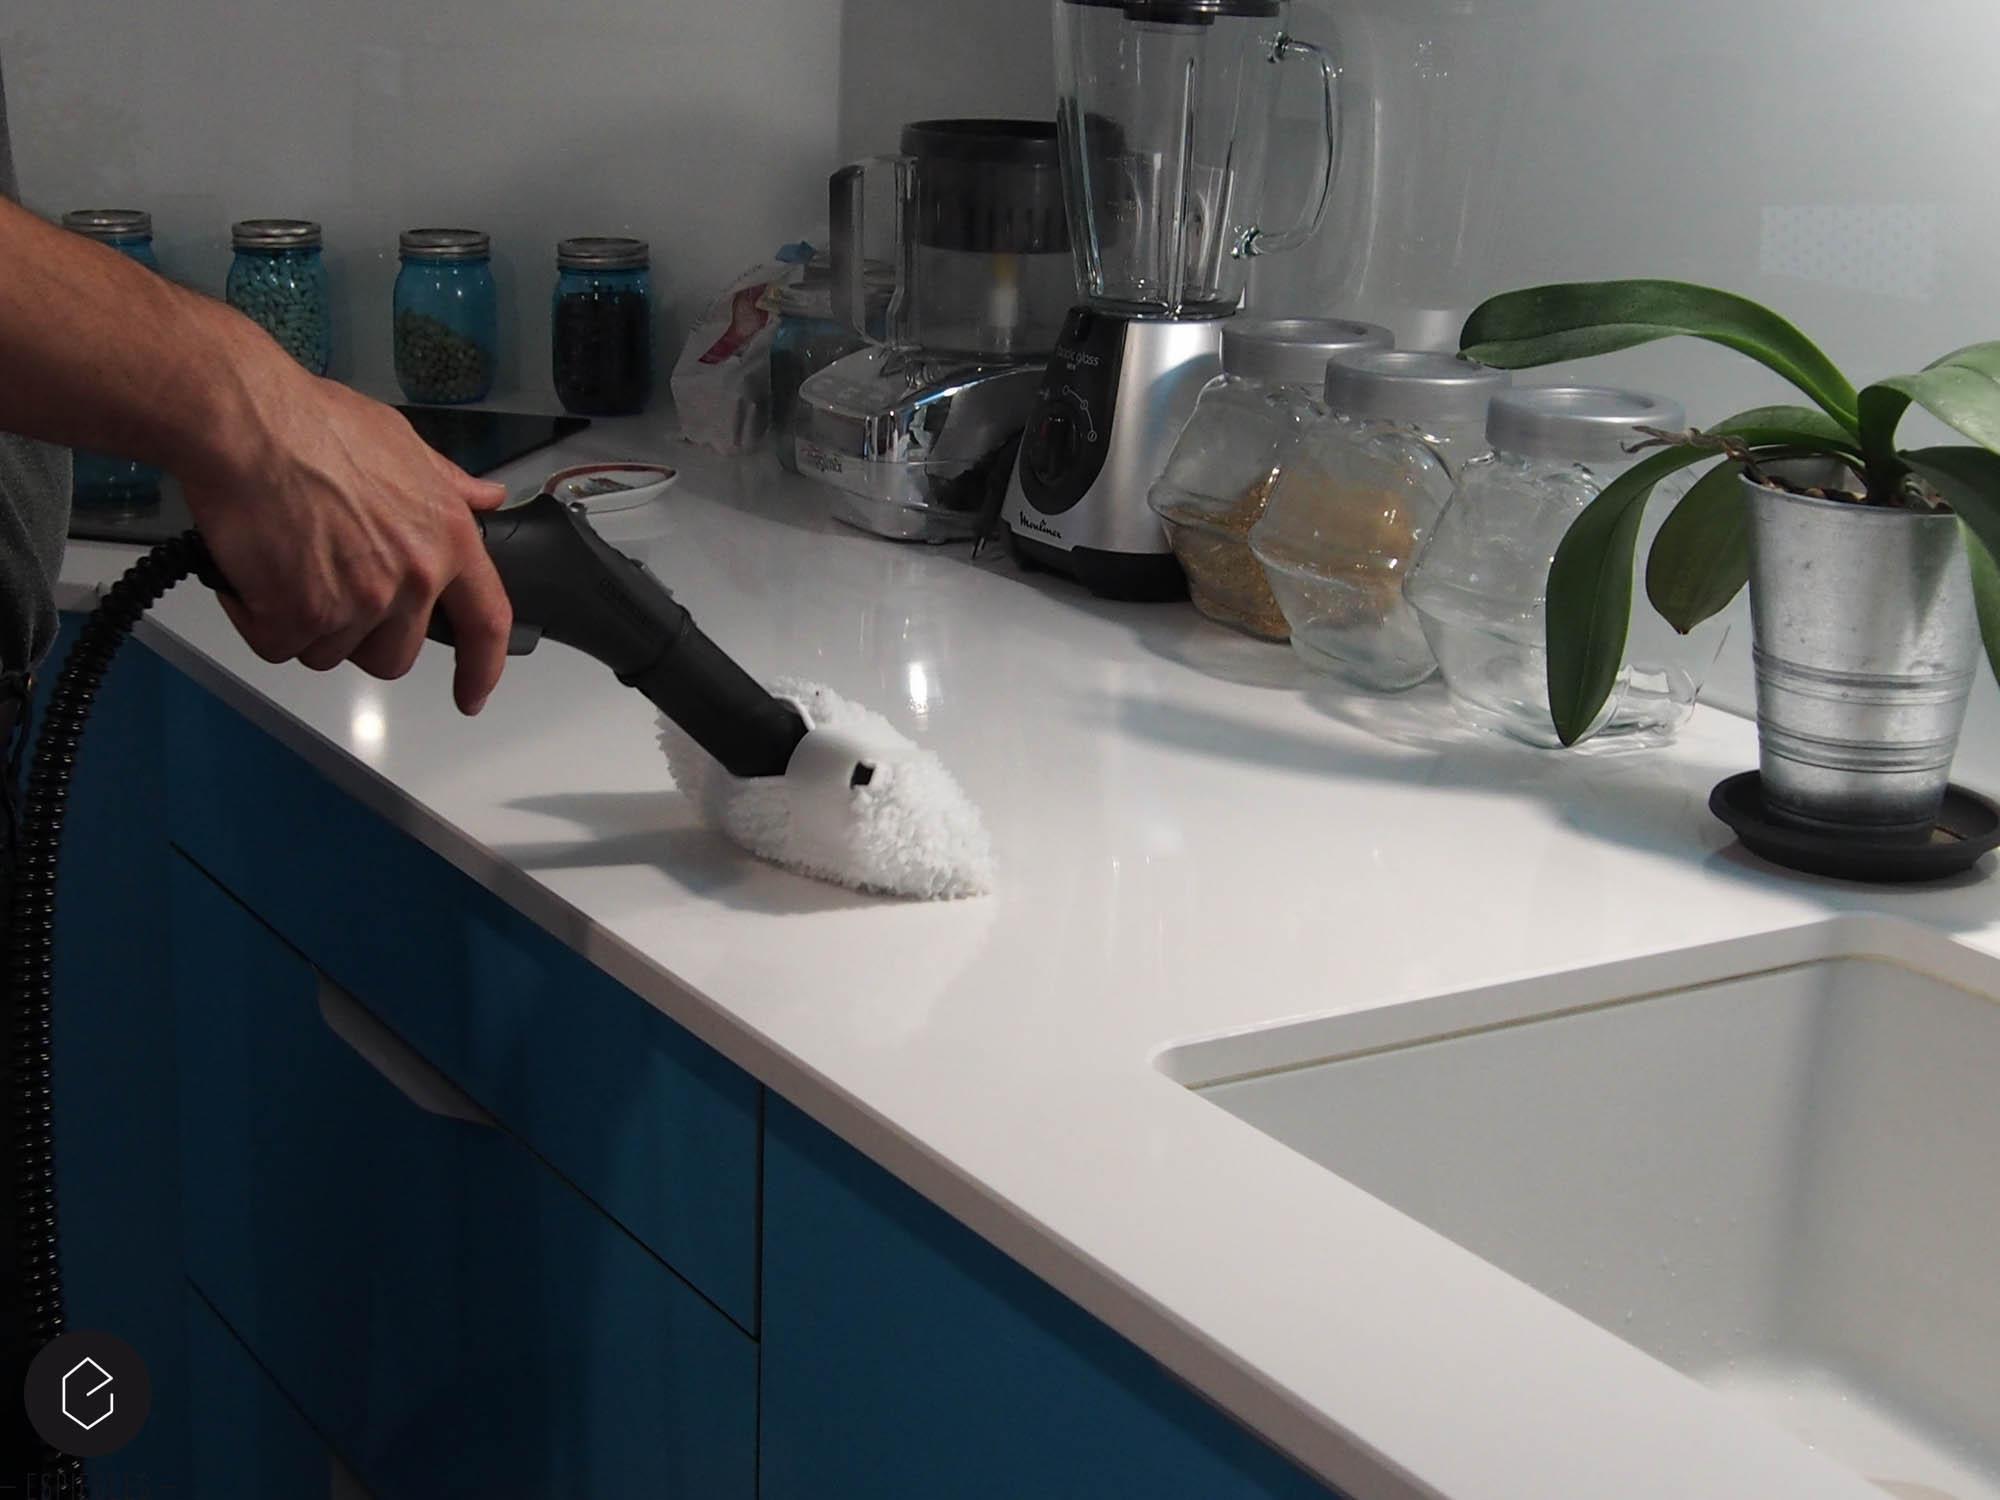 Nettoyer la vapeur espiegles - Nettoyeur vapeur salle de bain ...